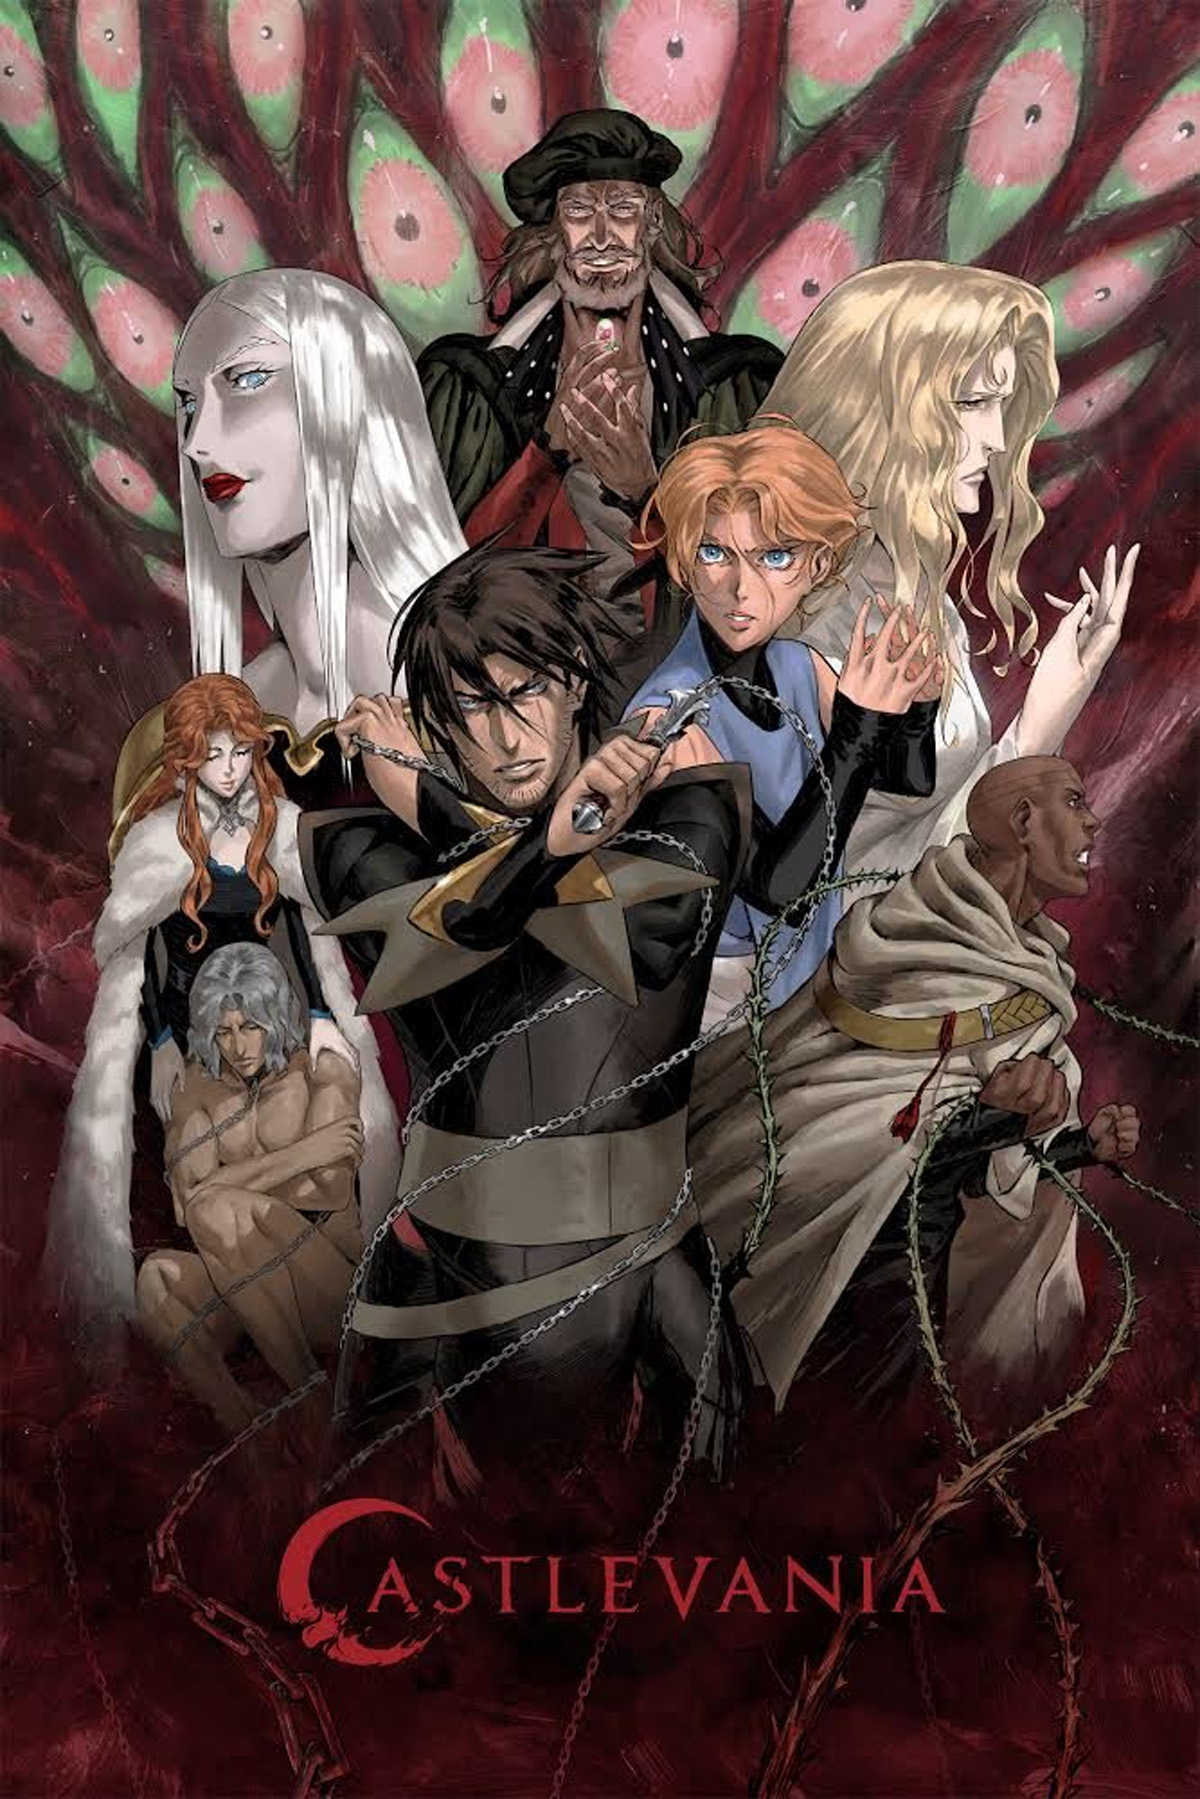 castlevania-season-3-poster-netflix